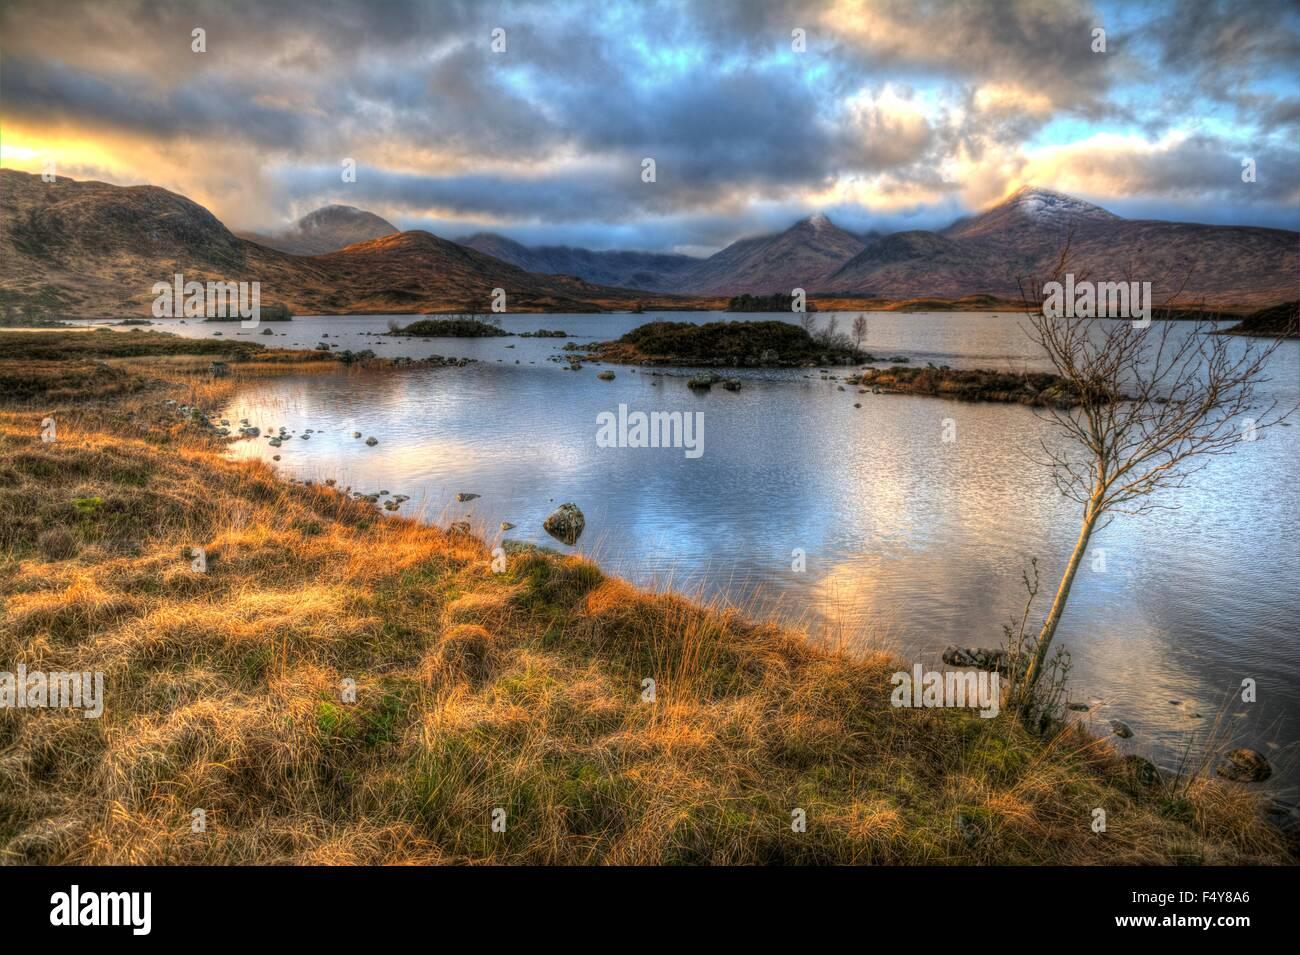 Autumn sunset over Rannoch Moor,Scottish Highlands - Stock Image